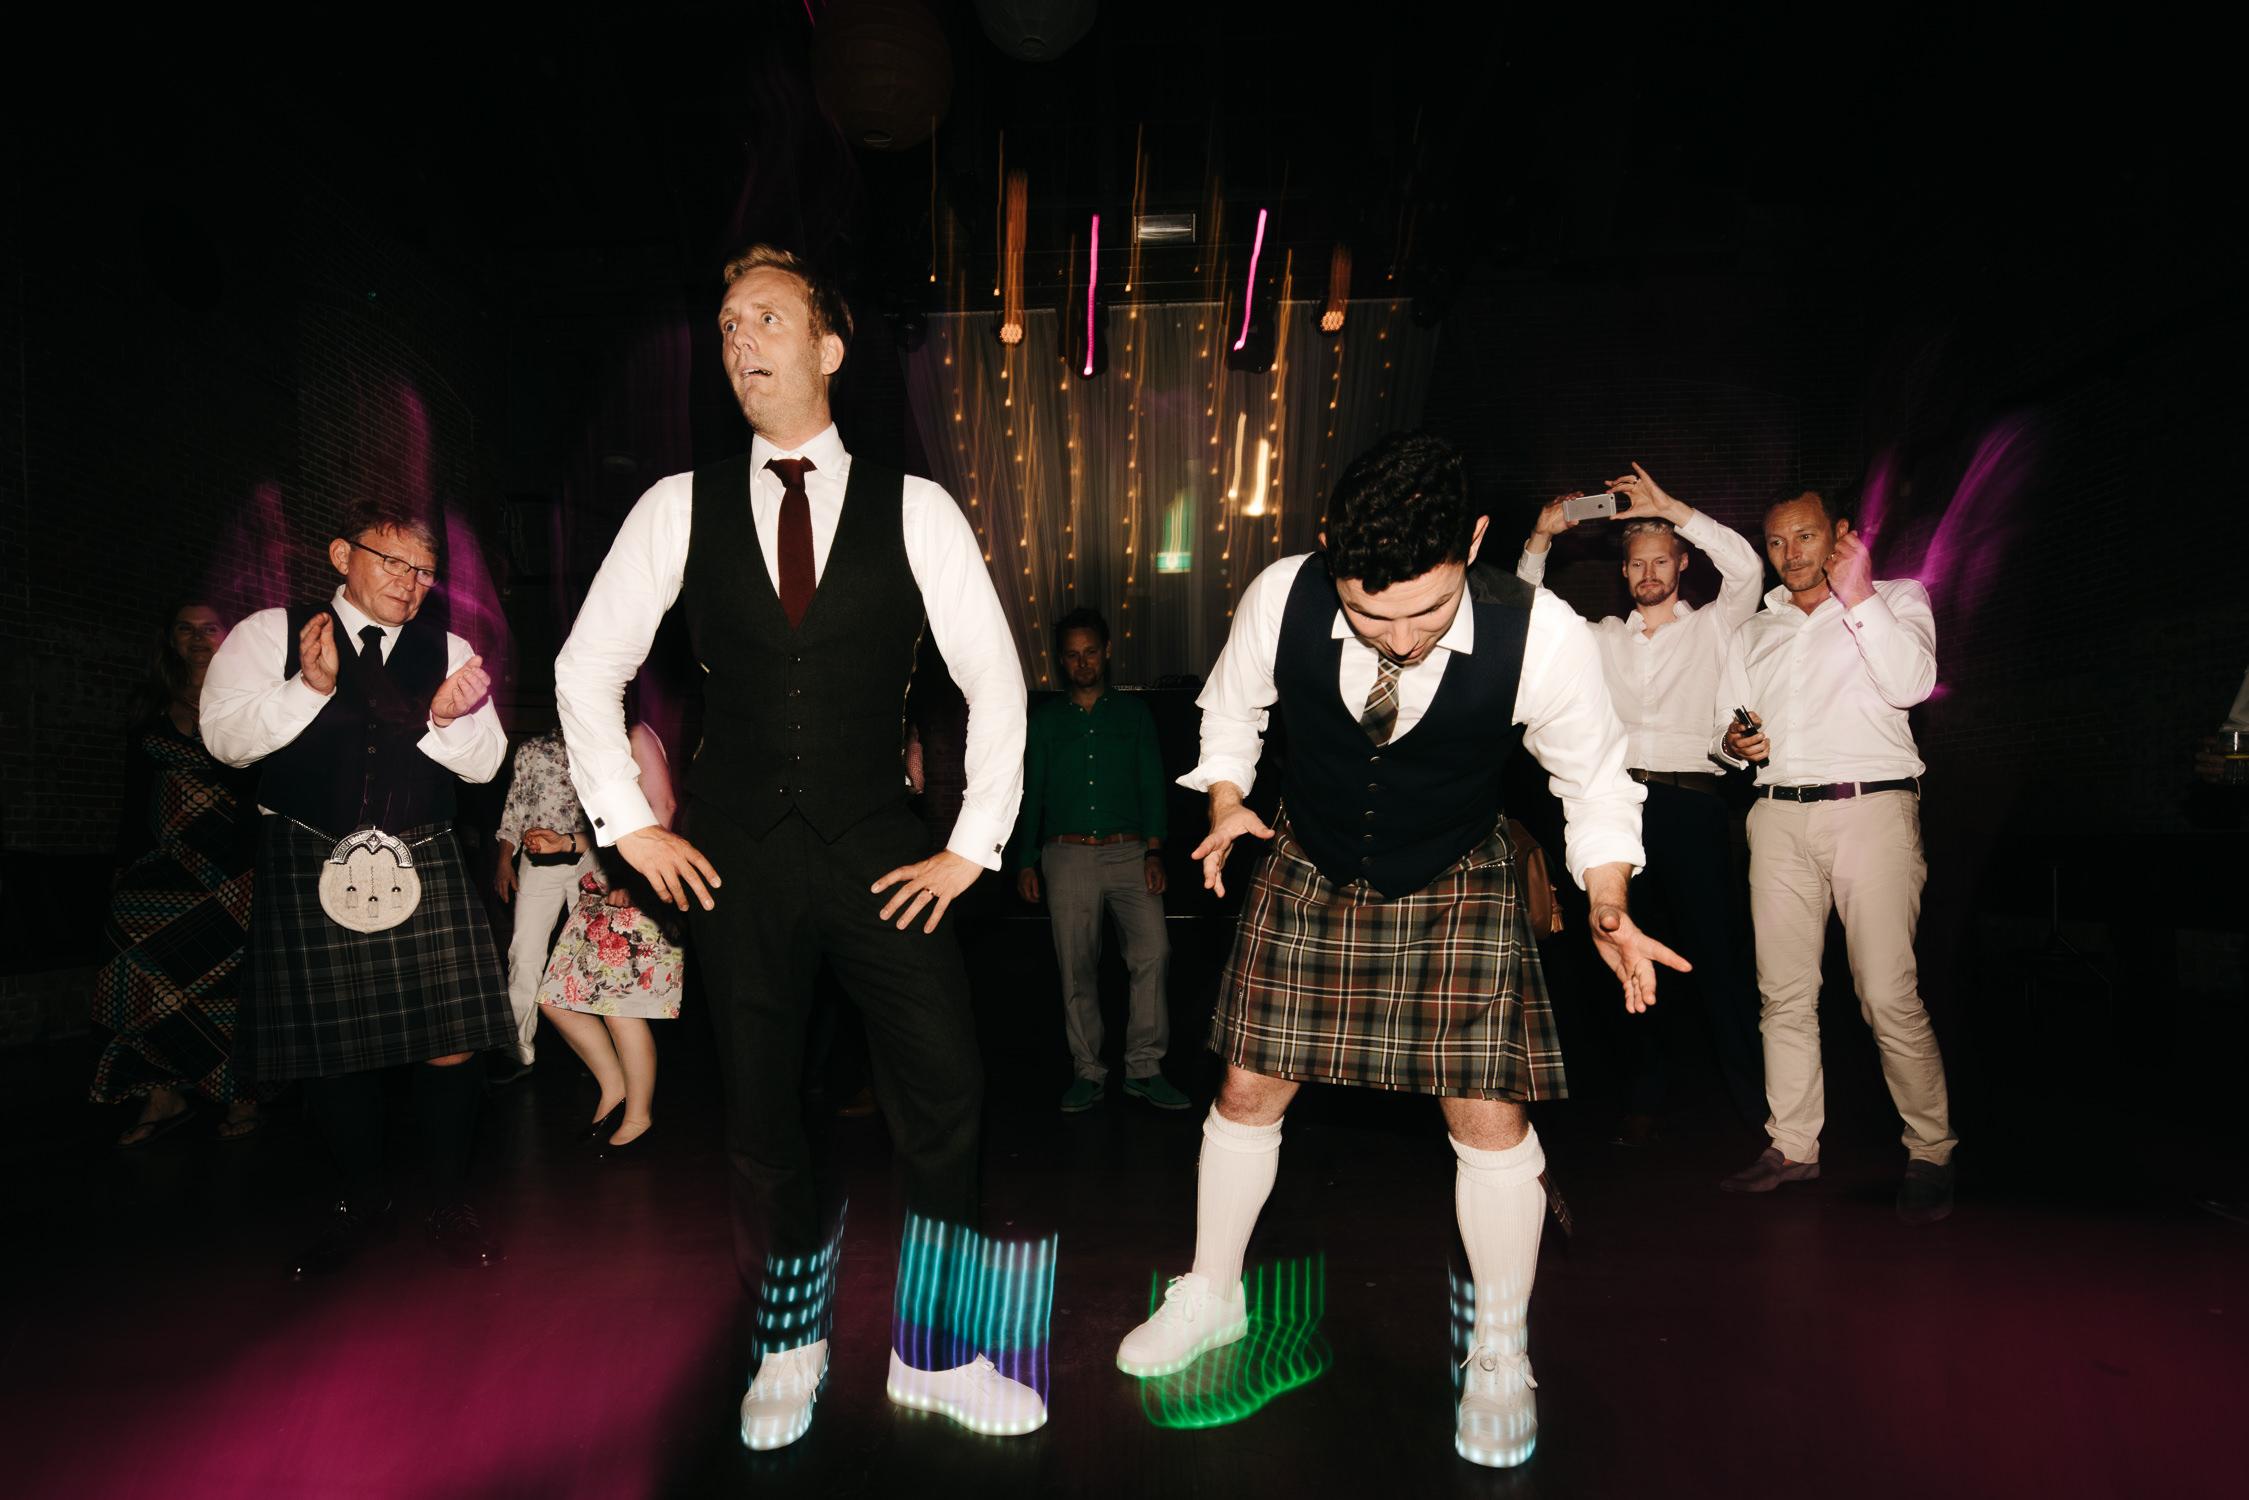 bruidsfotografie amsterdam feest en dansen bruidspaar